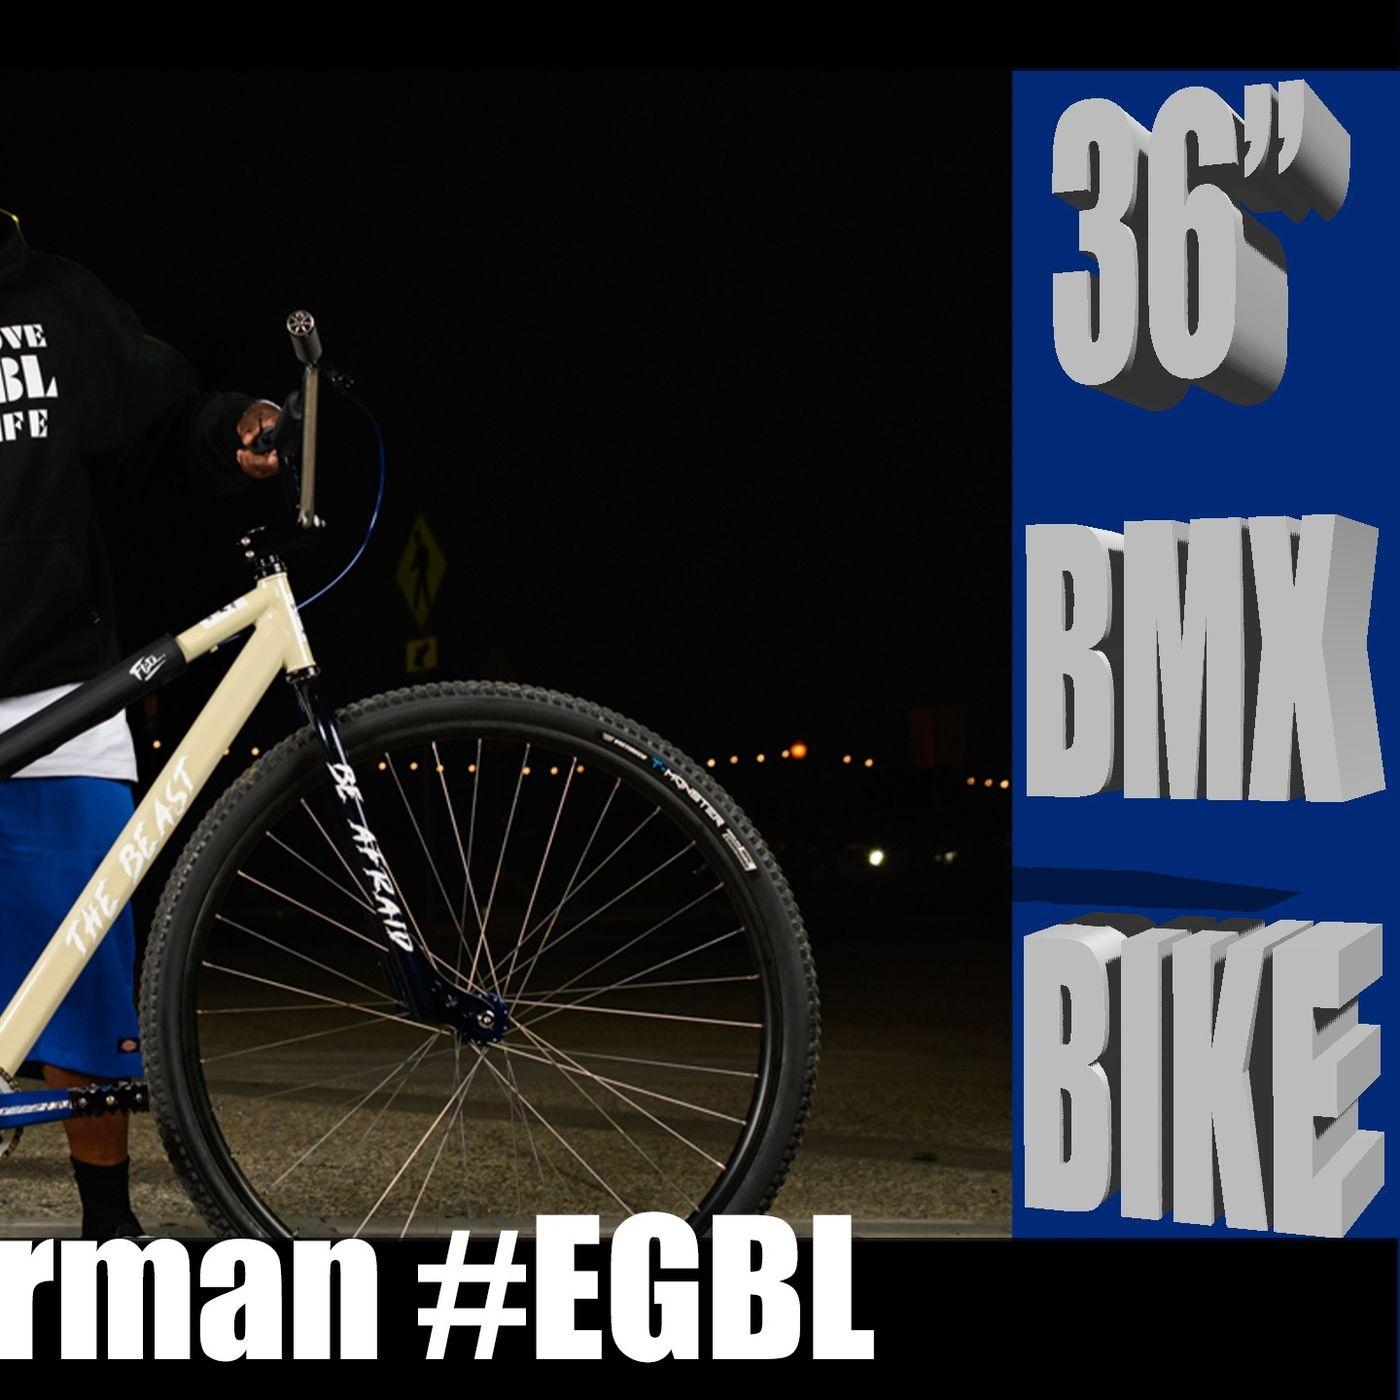 "Custom 36"" BMX Bike! Talk bikes with Dozier of Elk Grove Bikelife"